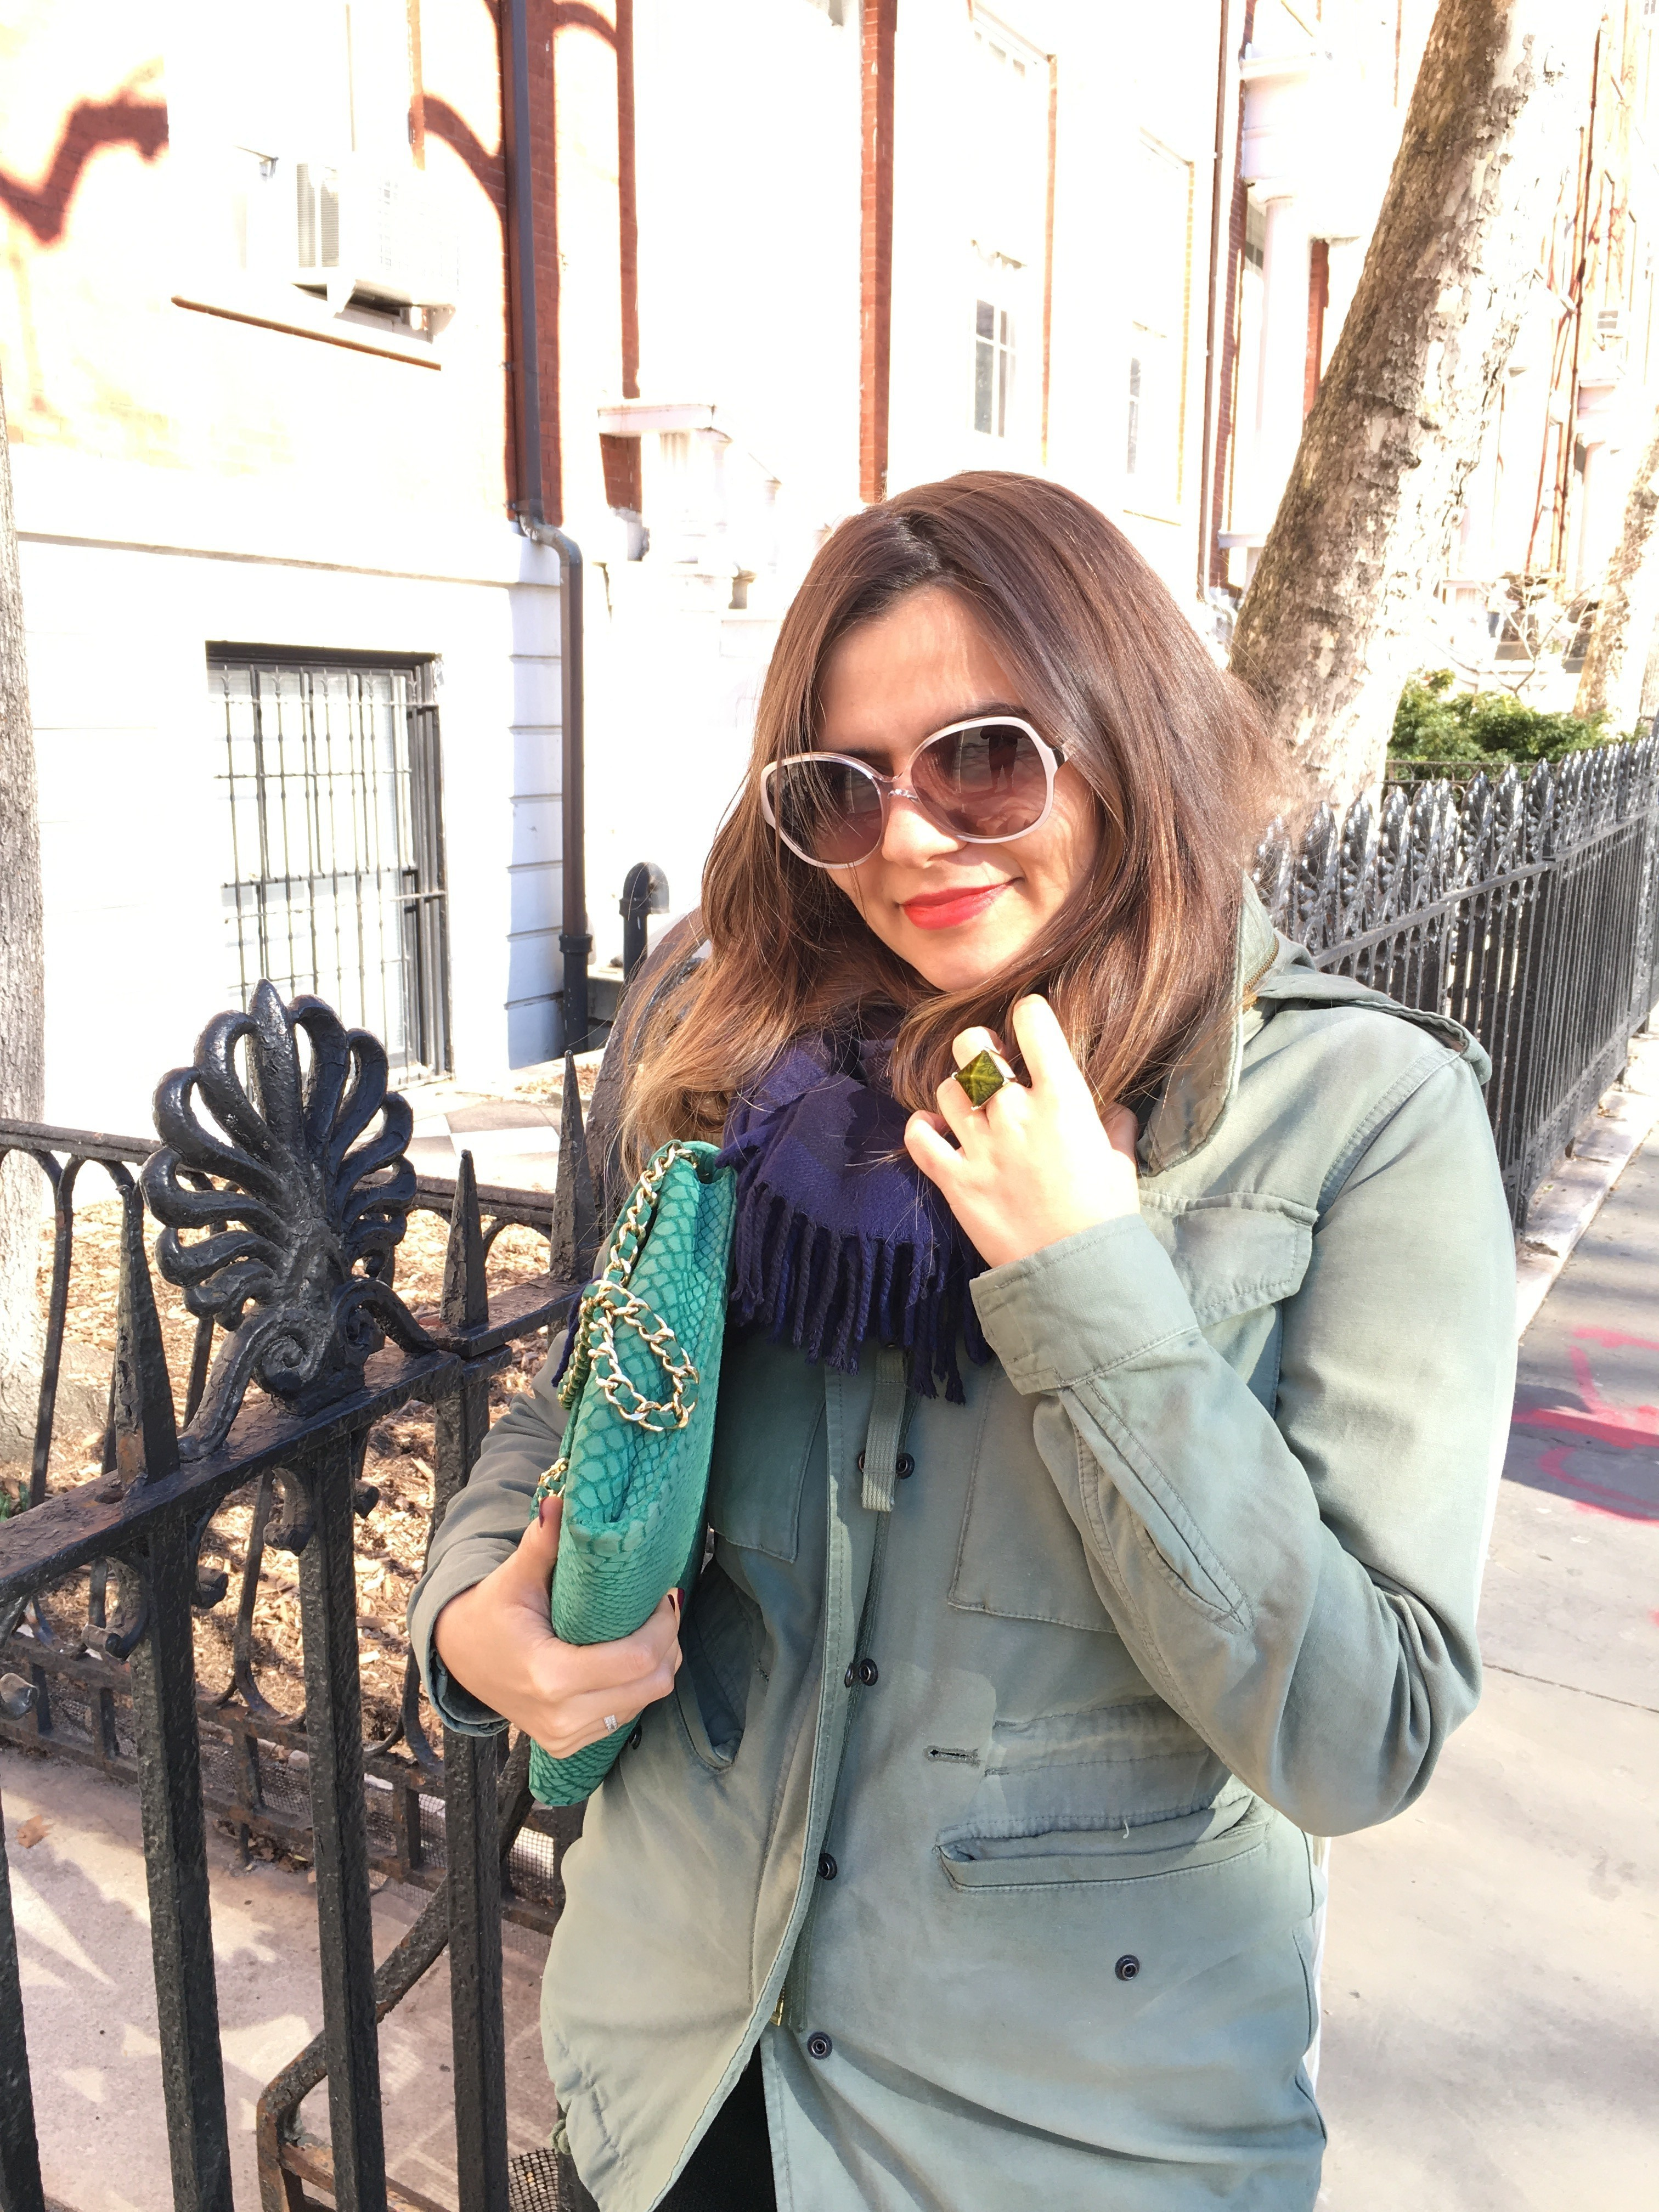 casul_chic_dress_looks_alley_girl_new_york_fashion_blog3